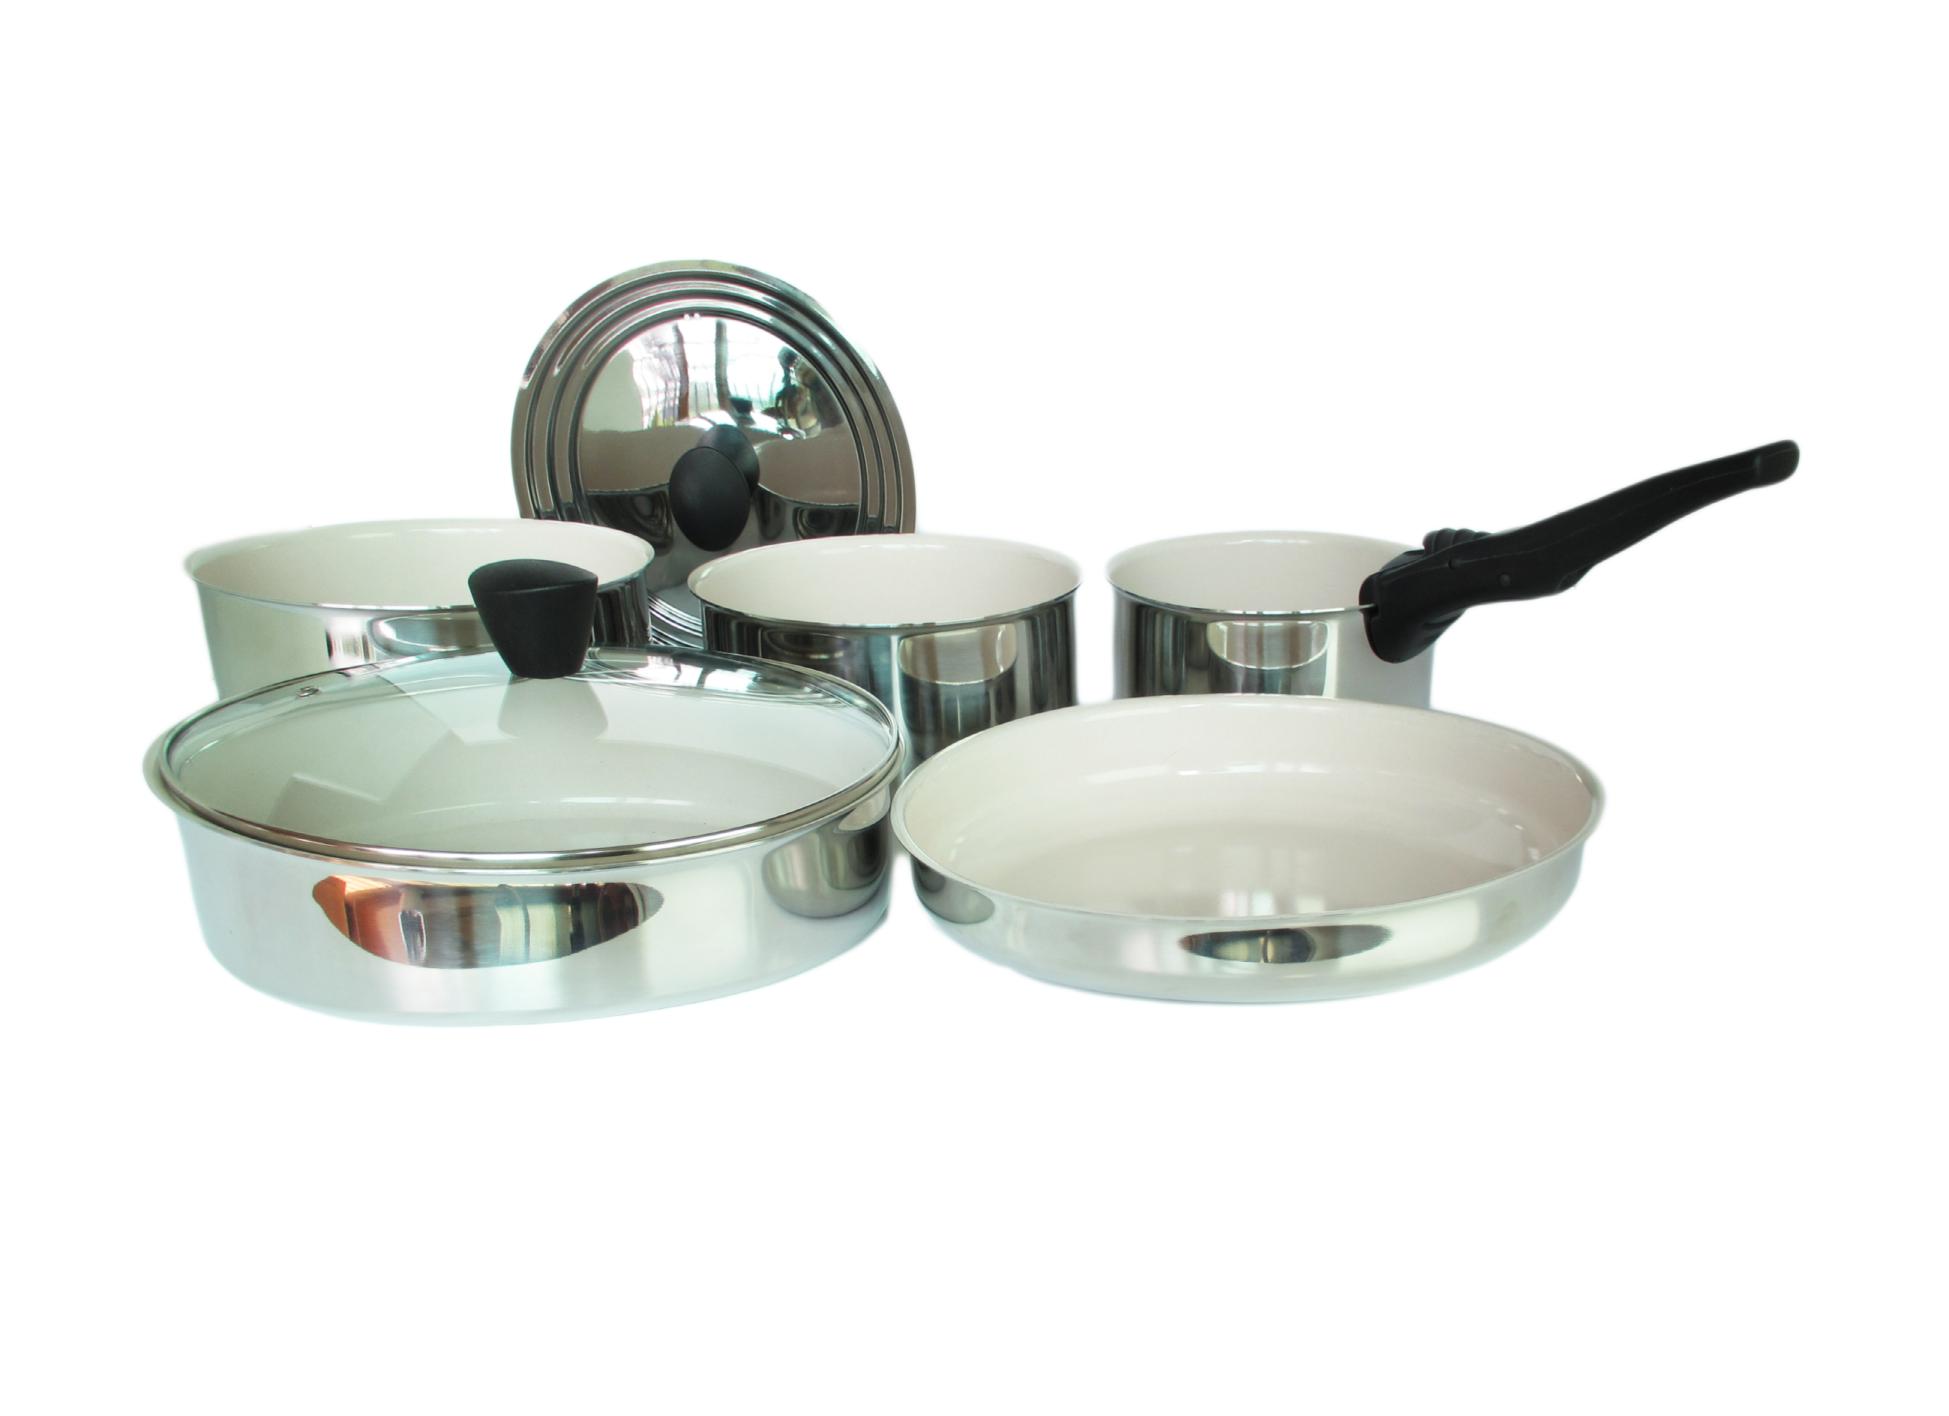 dsStainless metal pot set.png